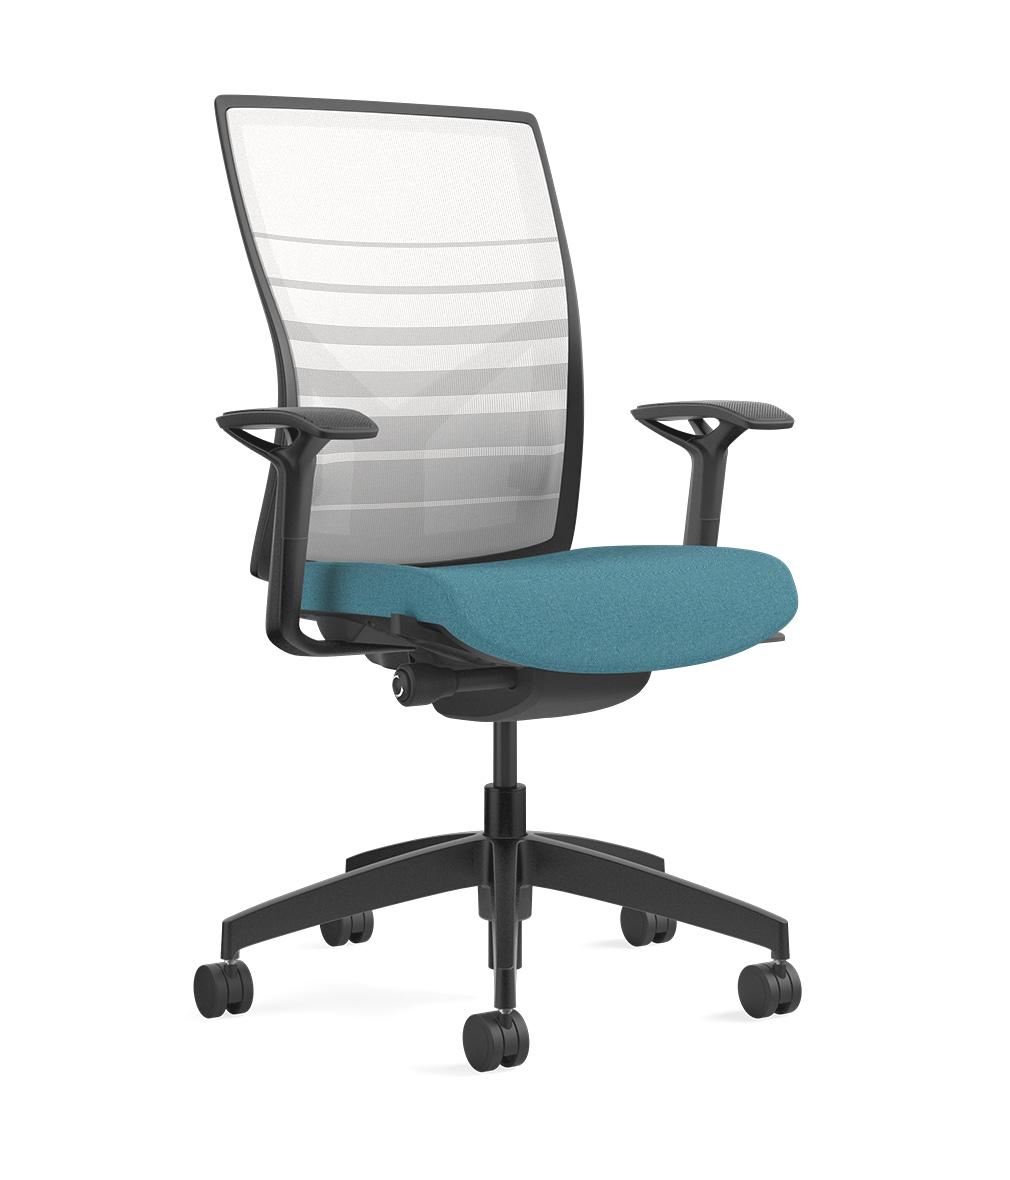 Torsa Chair Lovely torsa Task Work Chairs